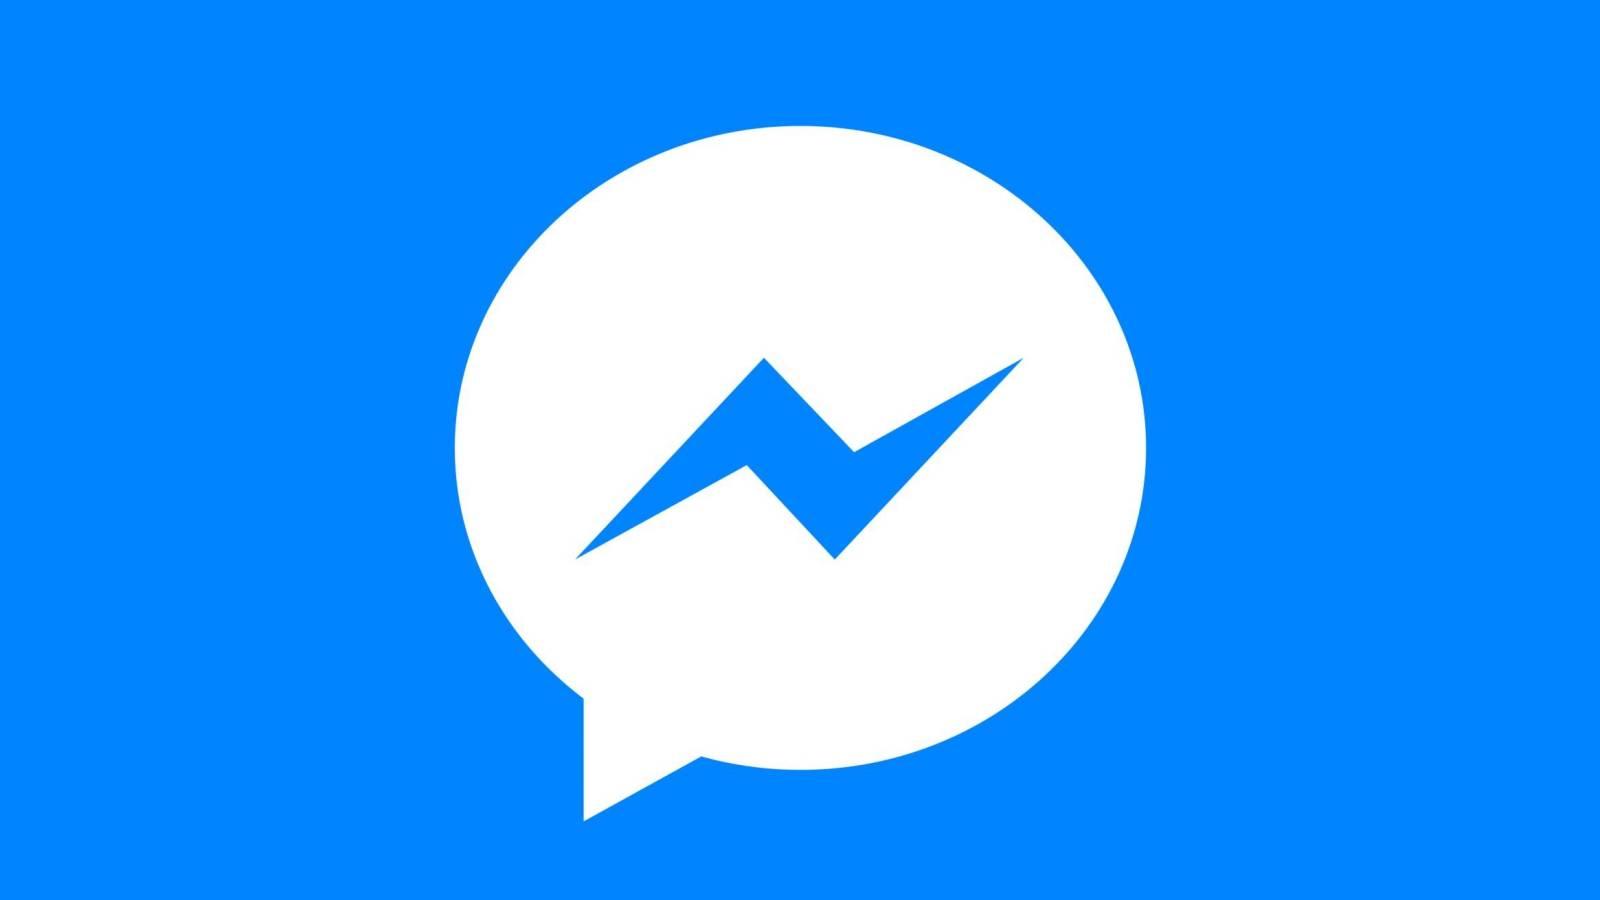 Facebook Messenger Update pentru Aplicatia Mobila Lansat Astazi